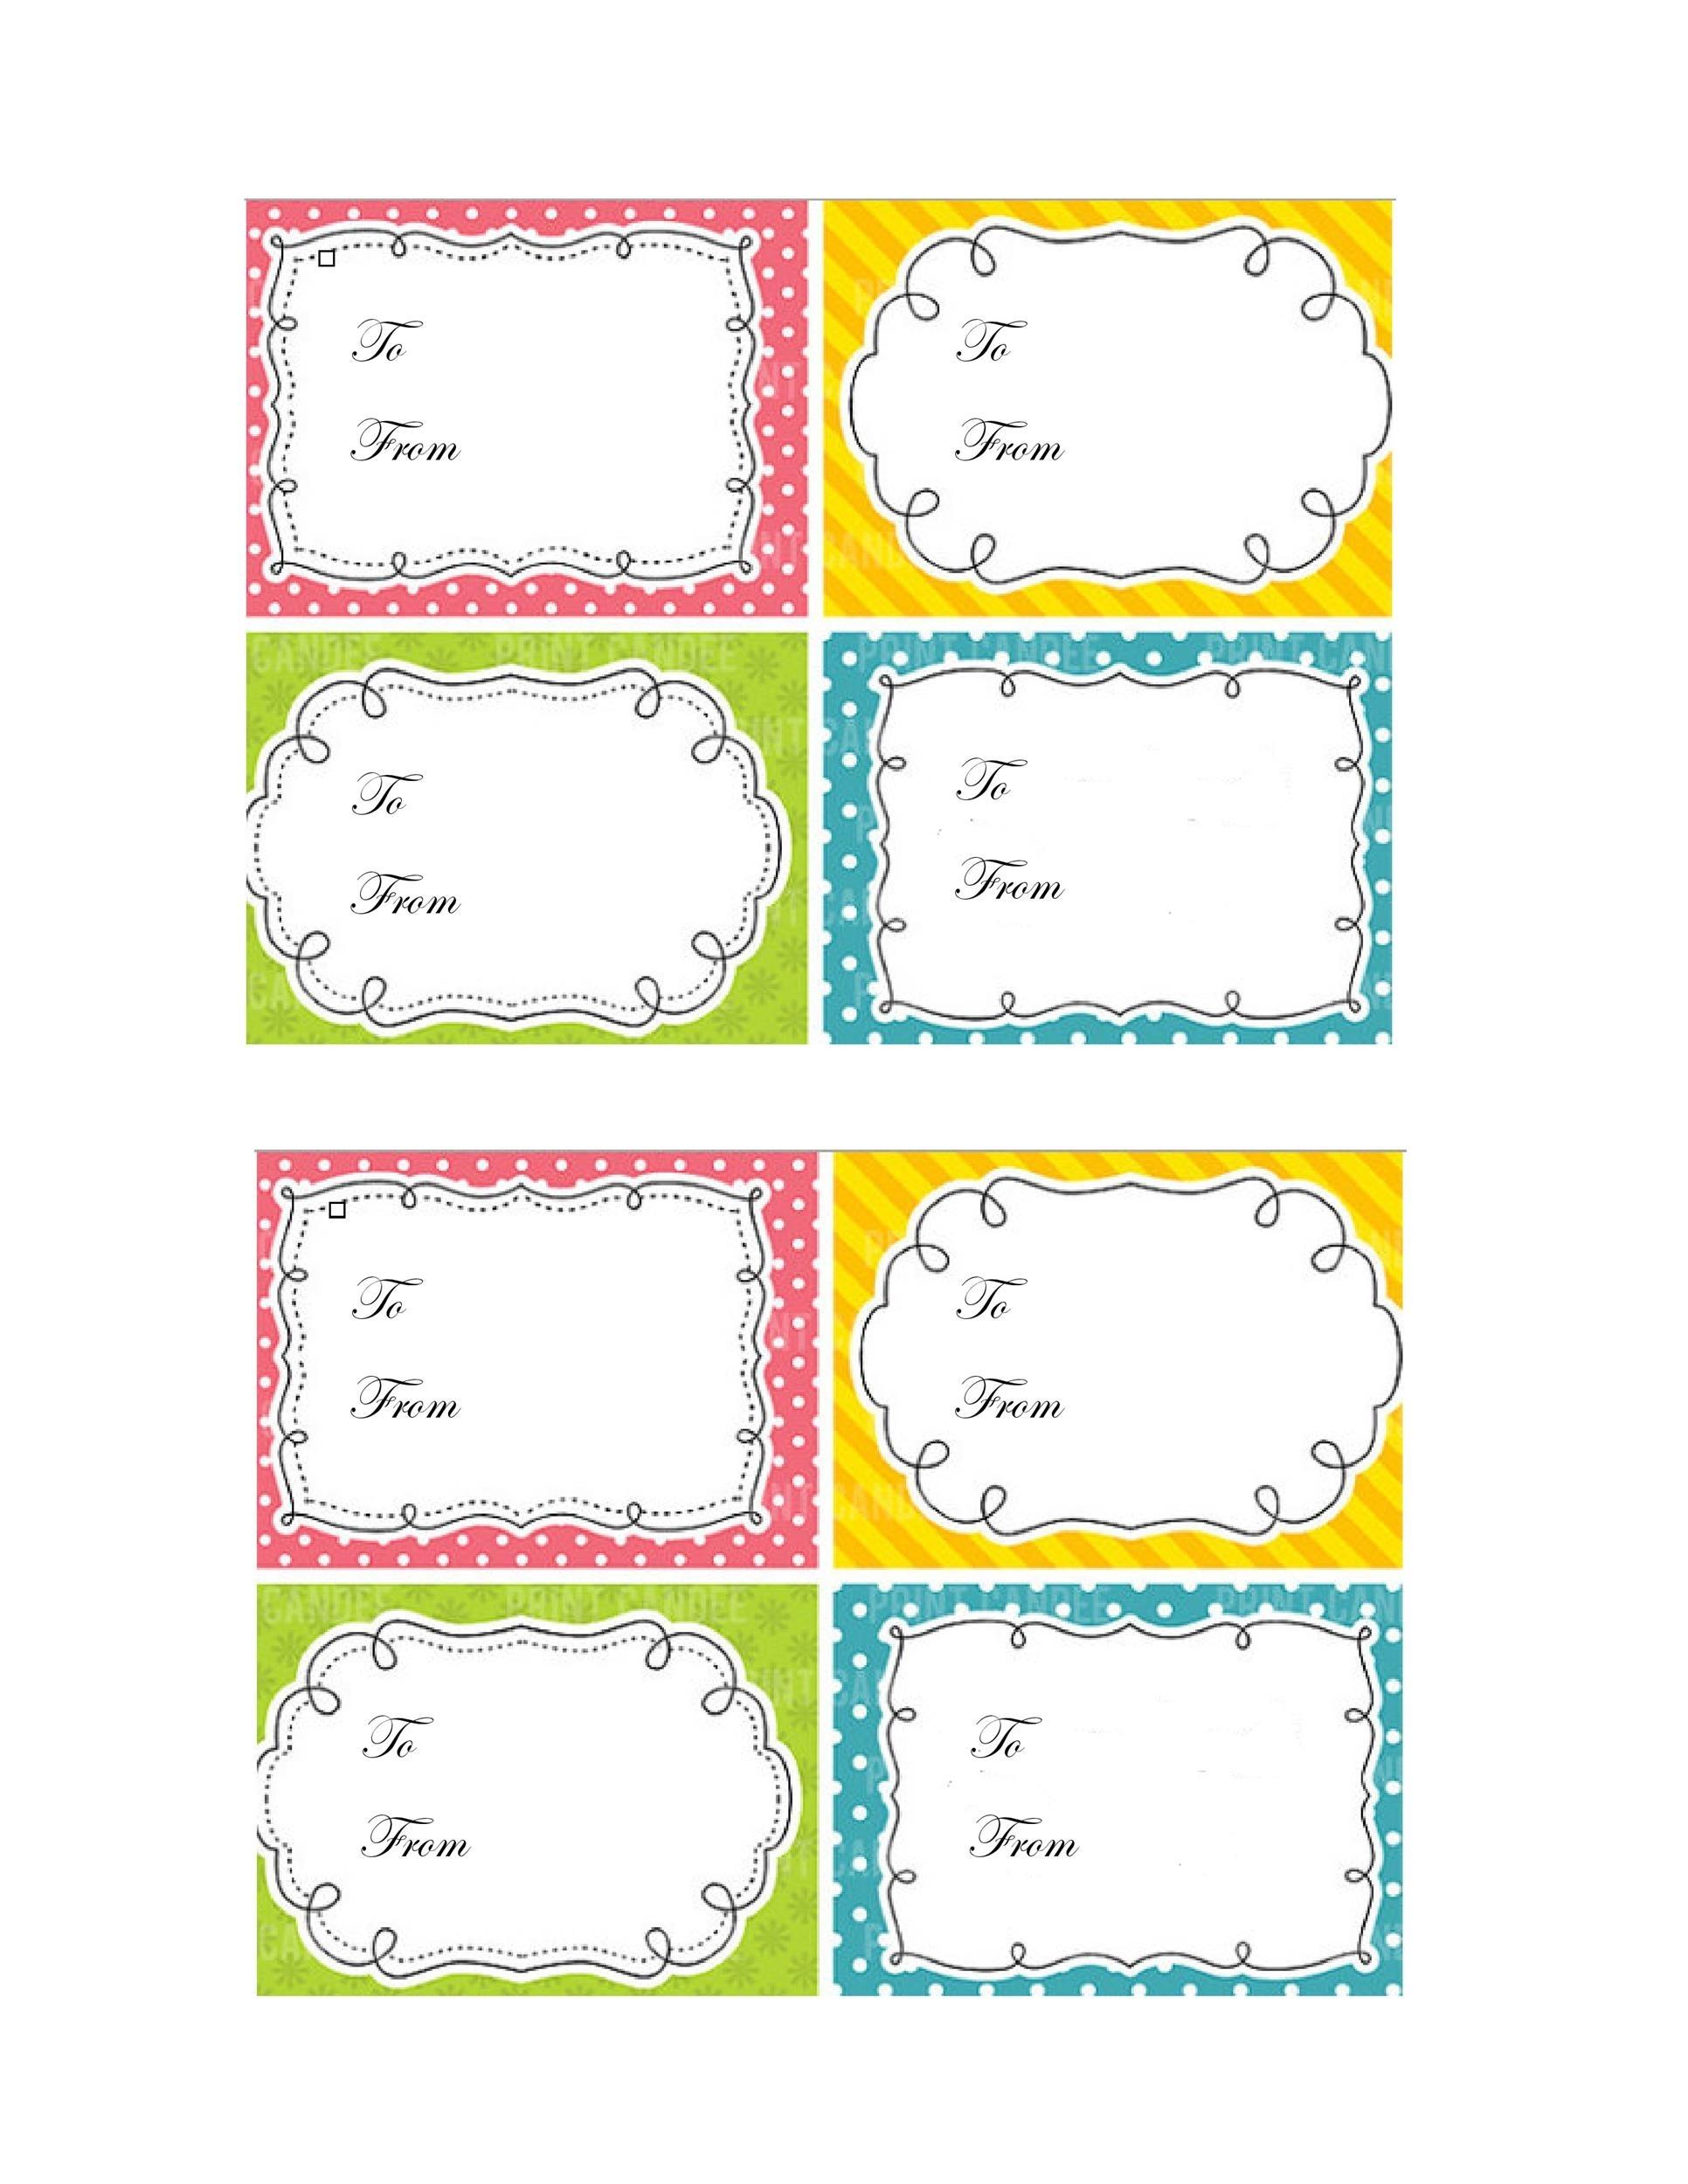 44 Free Printable Gift Tag Templates ᐅ Templatelab